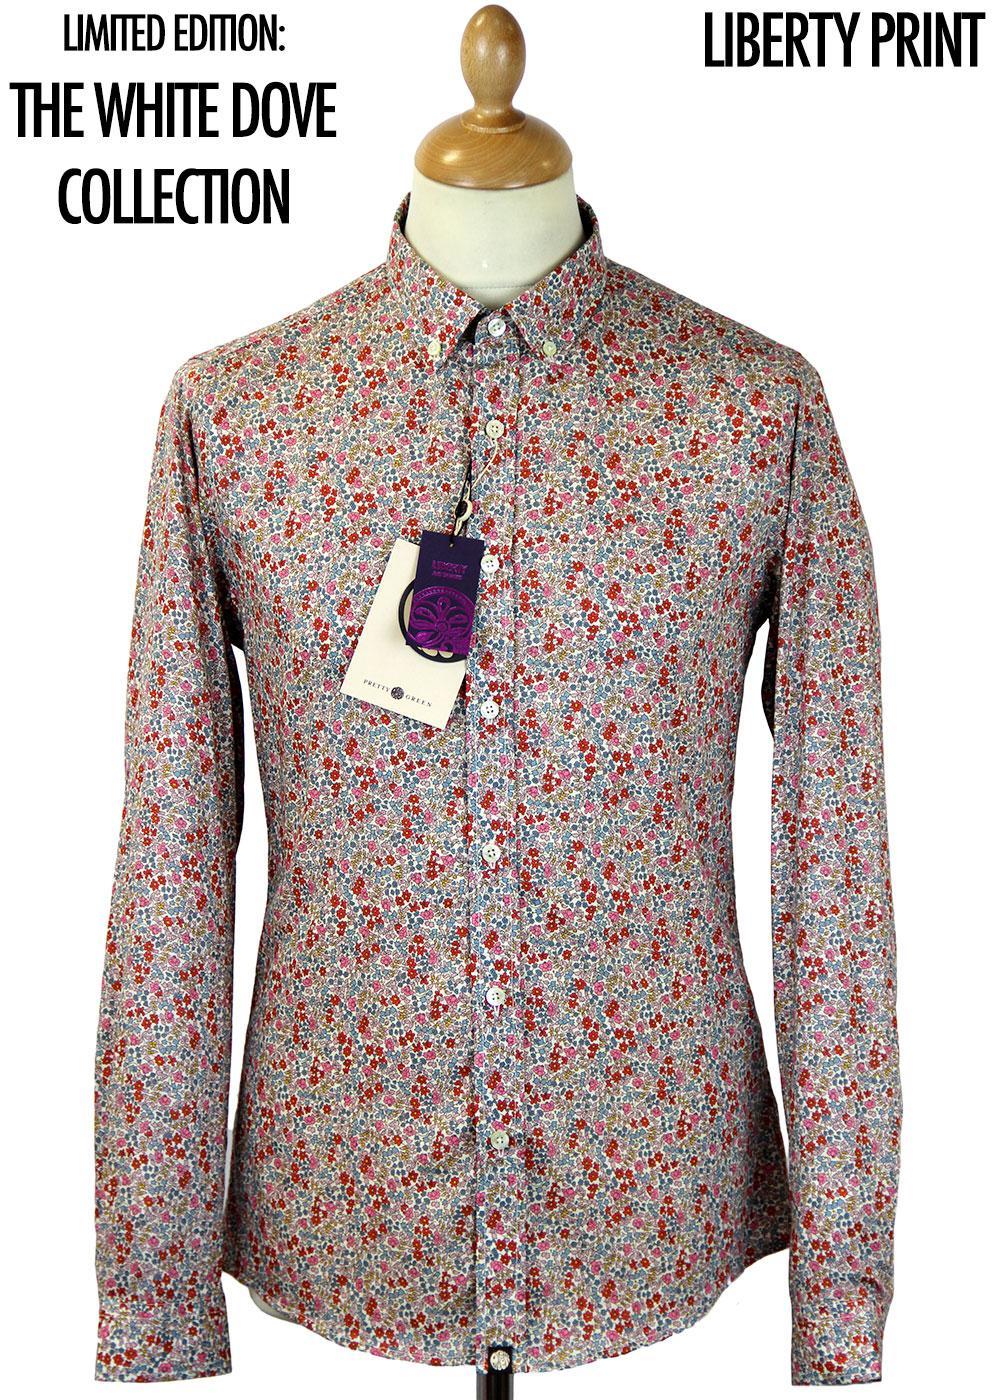 59189f13e72 PRETTY GREEN Retro Mod Camrose Floral Liberty Arts Fabric Shirt